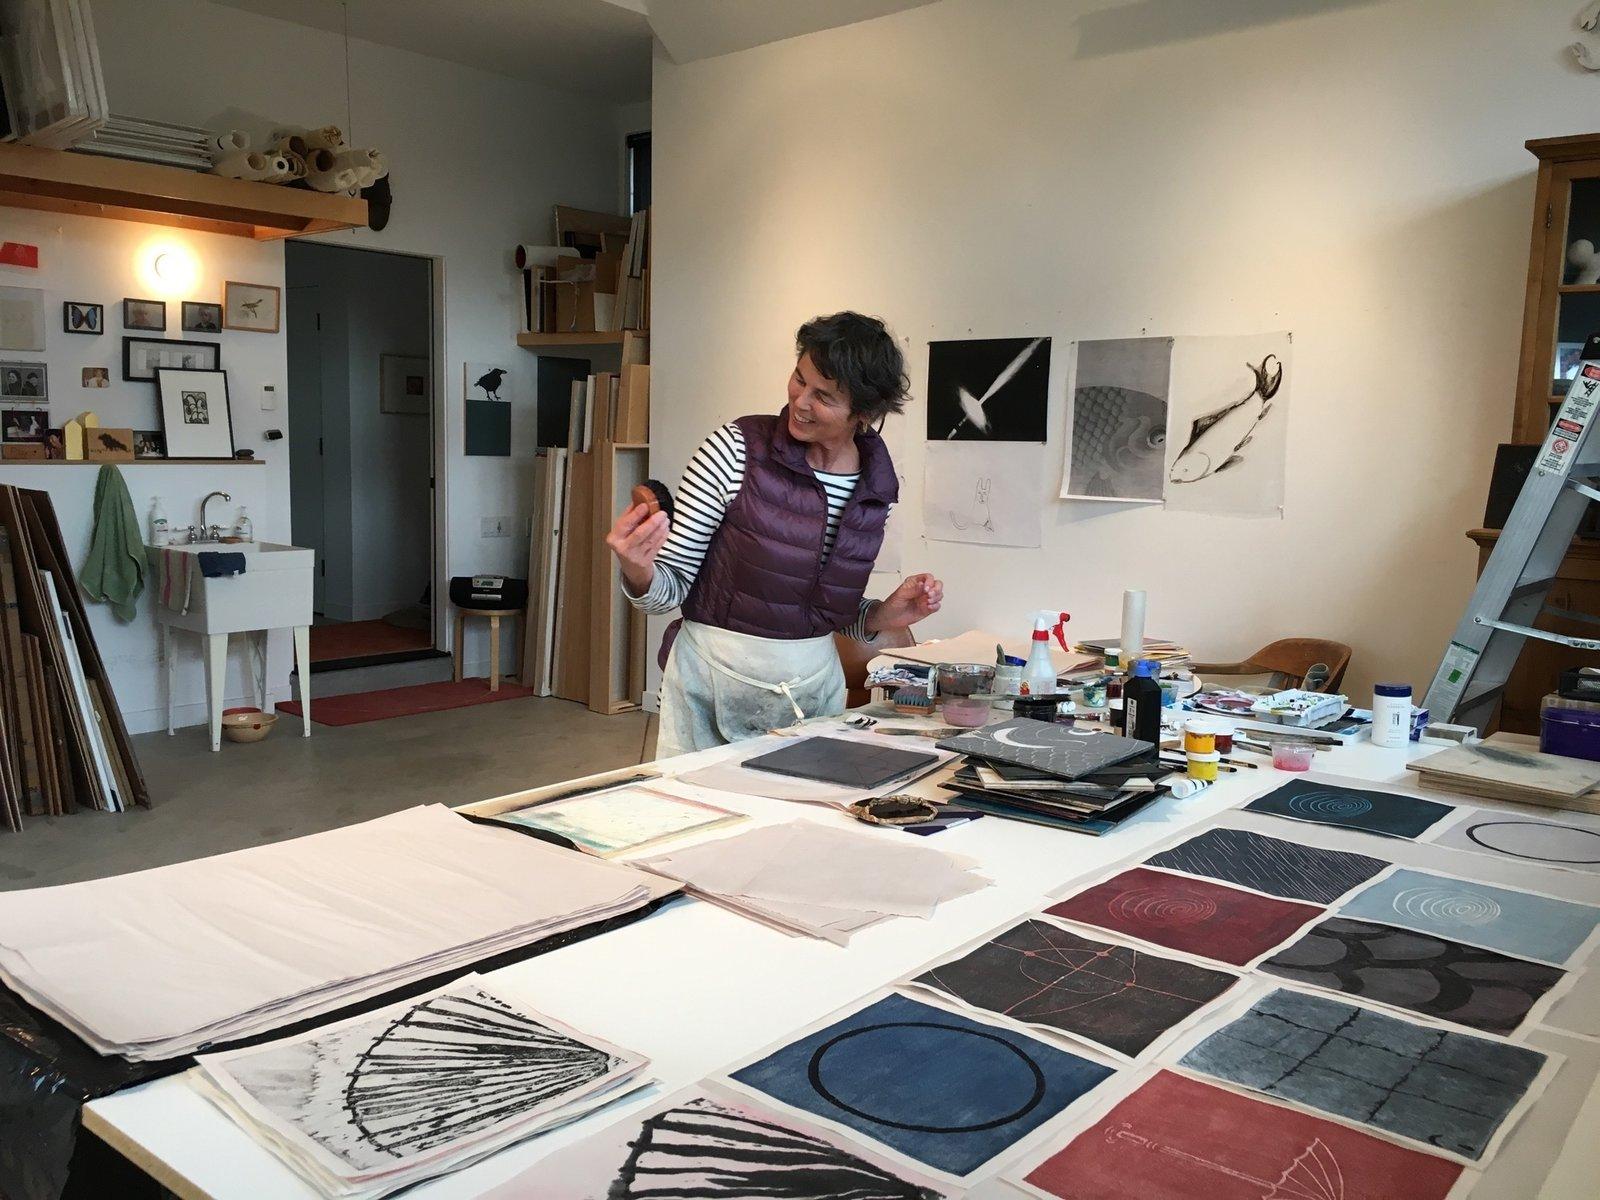 Marcia Weese in her studio in Carbondale, Colorado Growing Up Weese - Photo 7 of 16